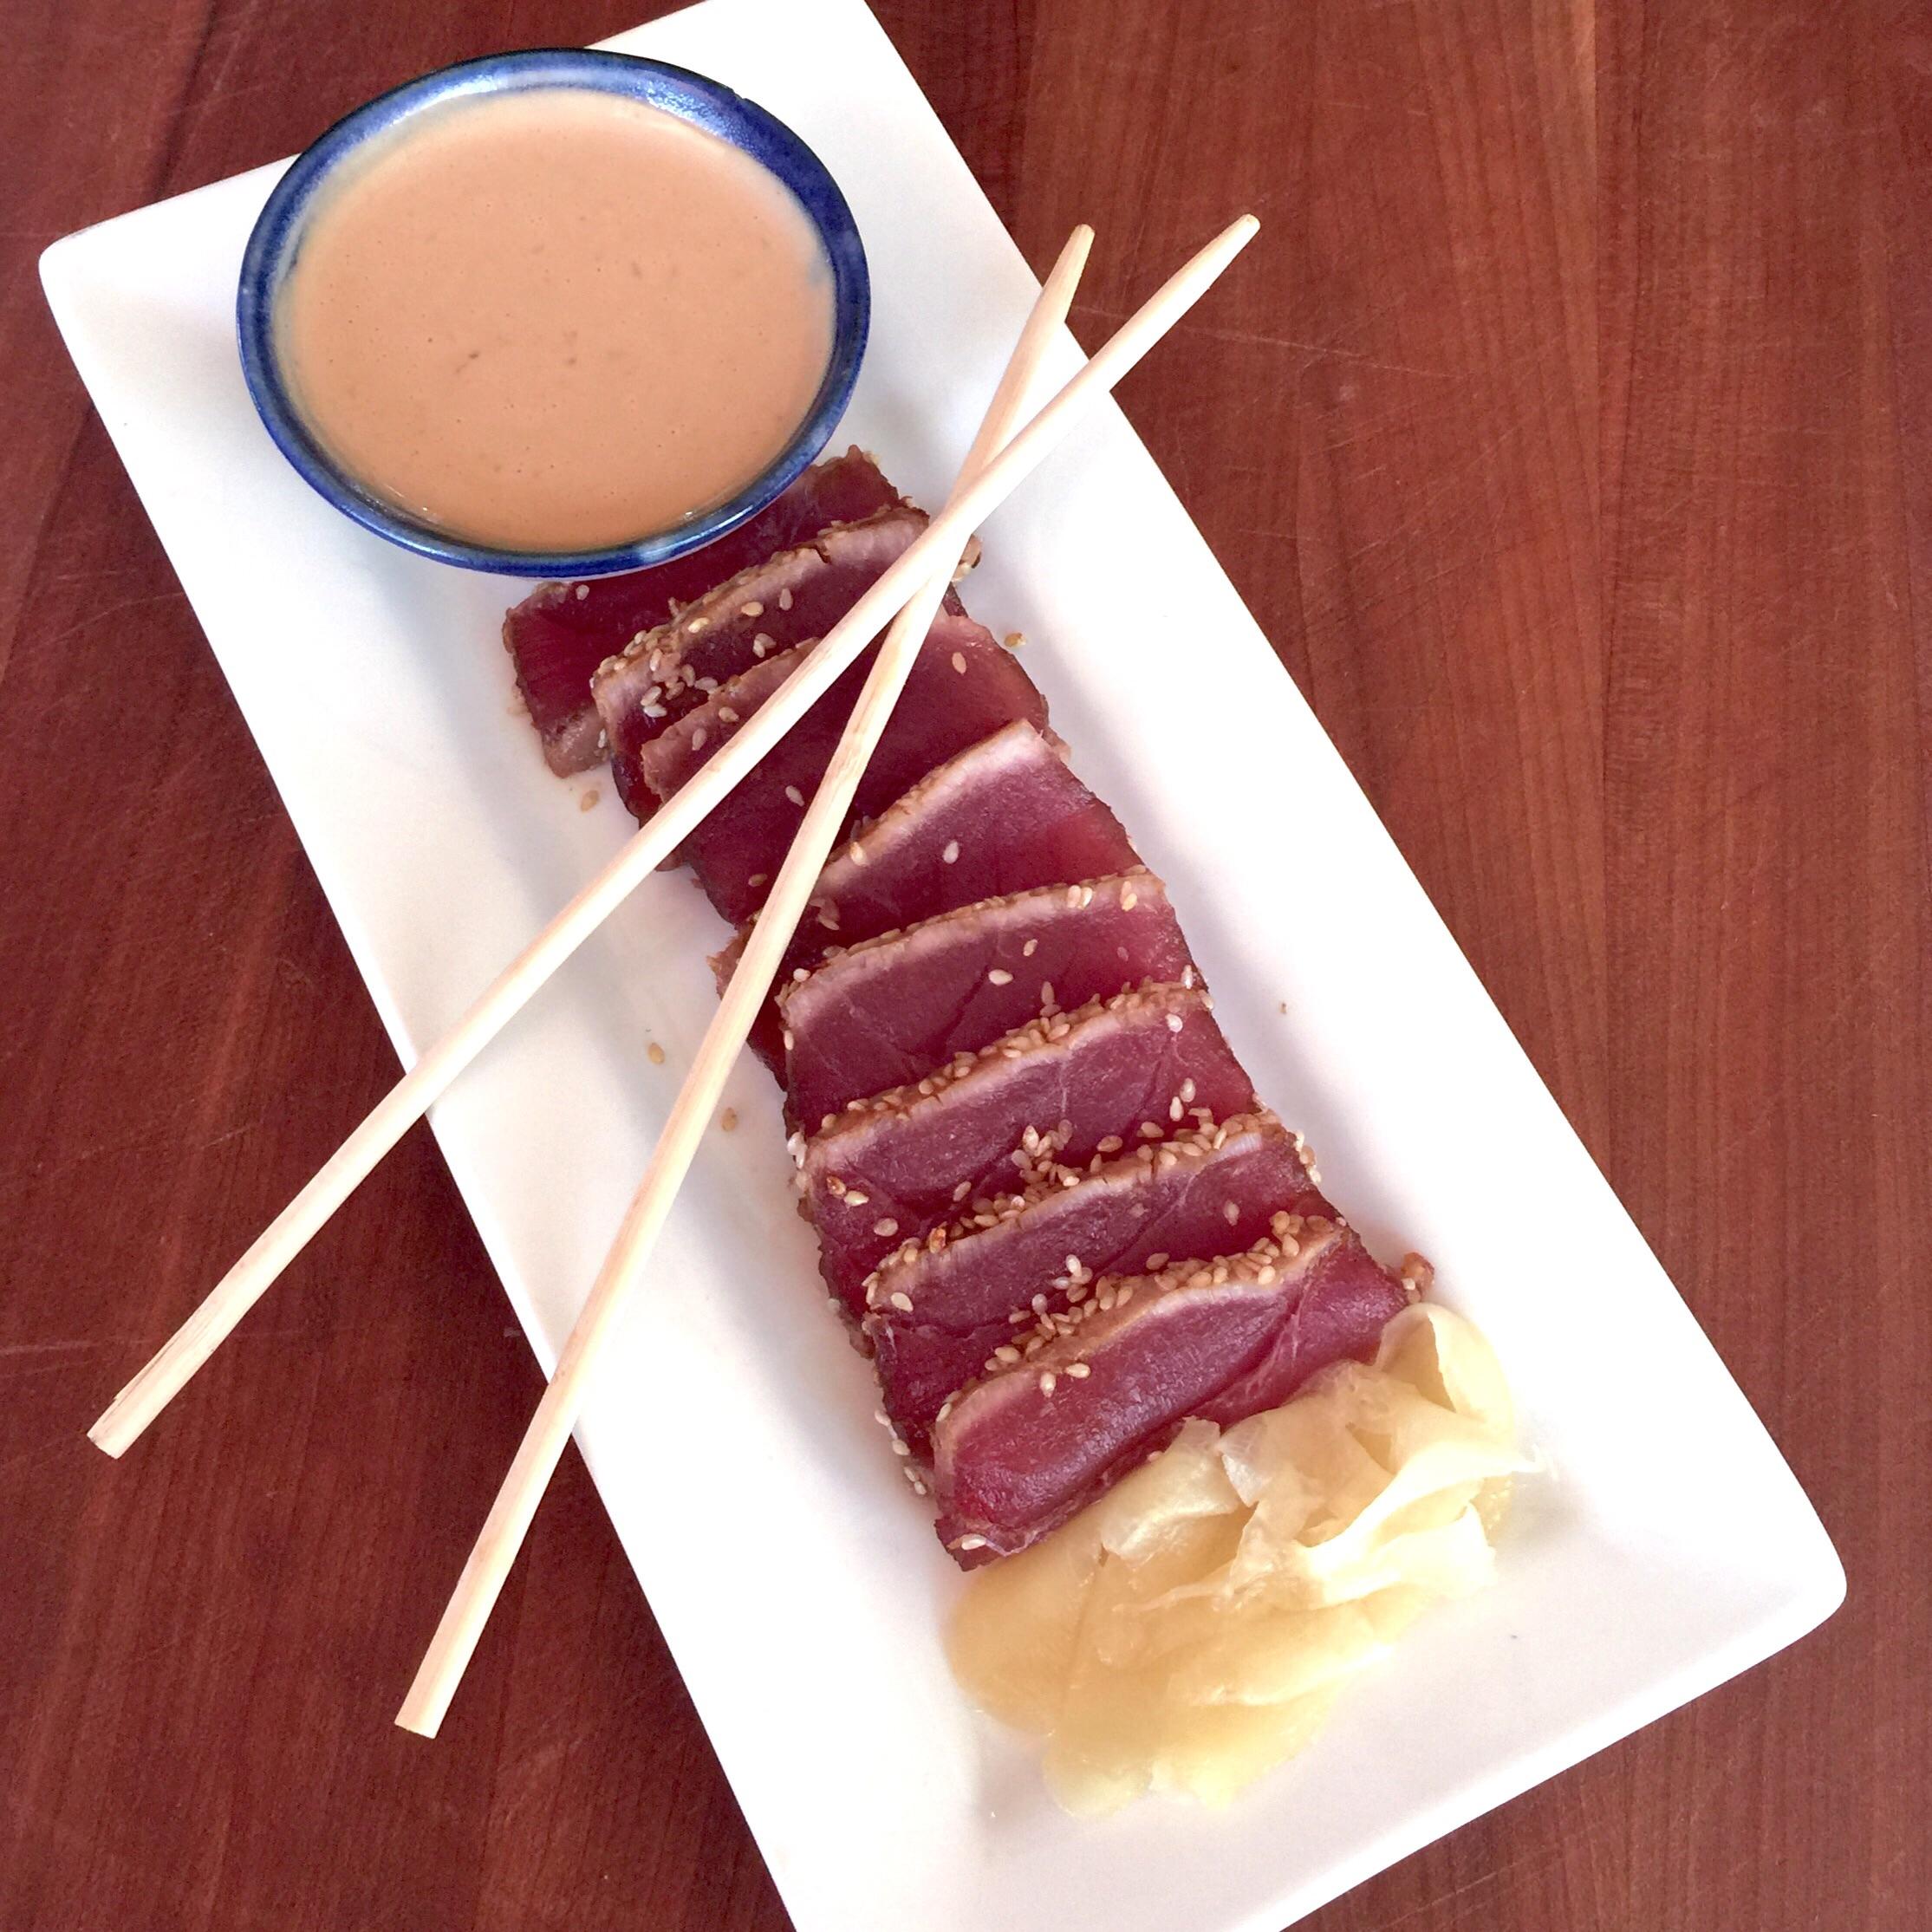 Seared Ahi Tuna with Chili Garlic Ginger Sauce